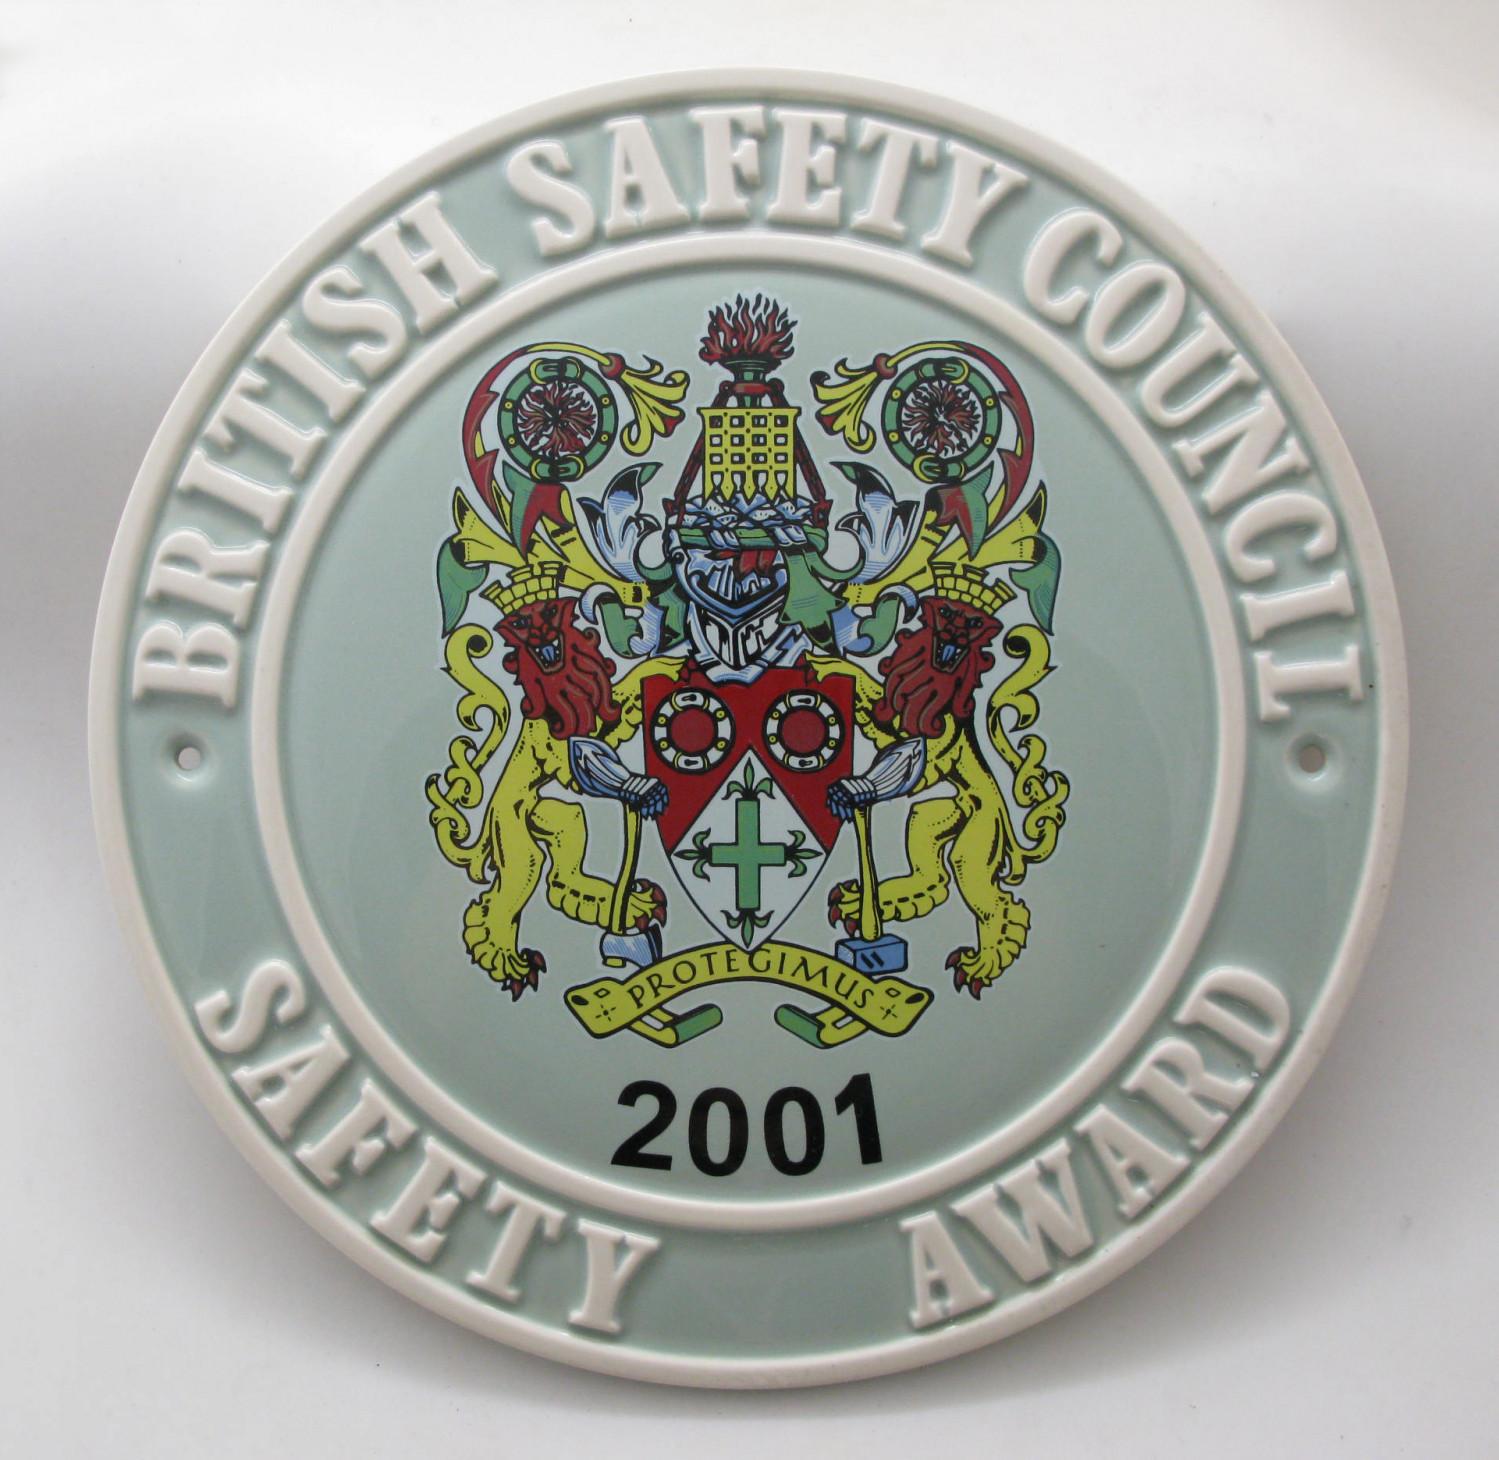 2001 Safety Award Plaque